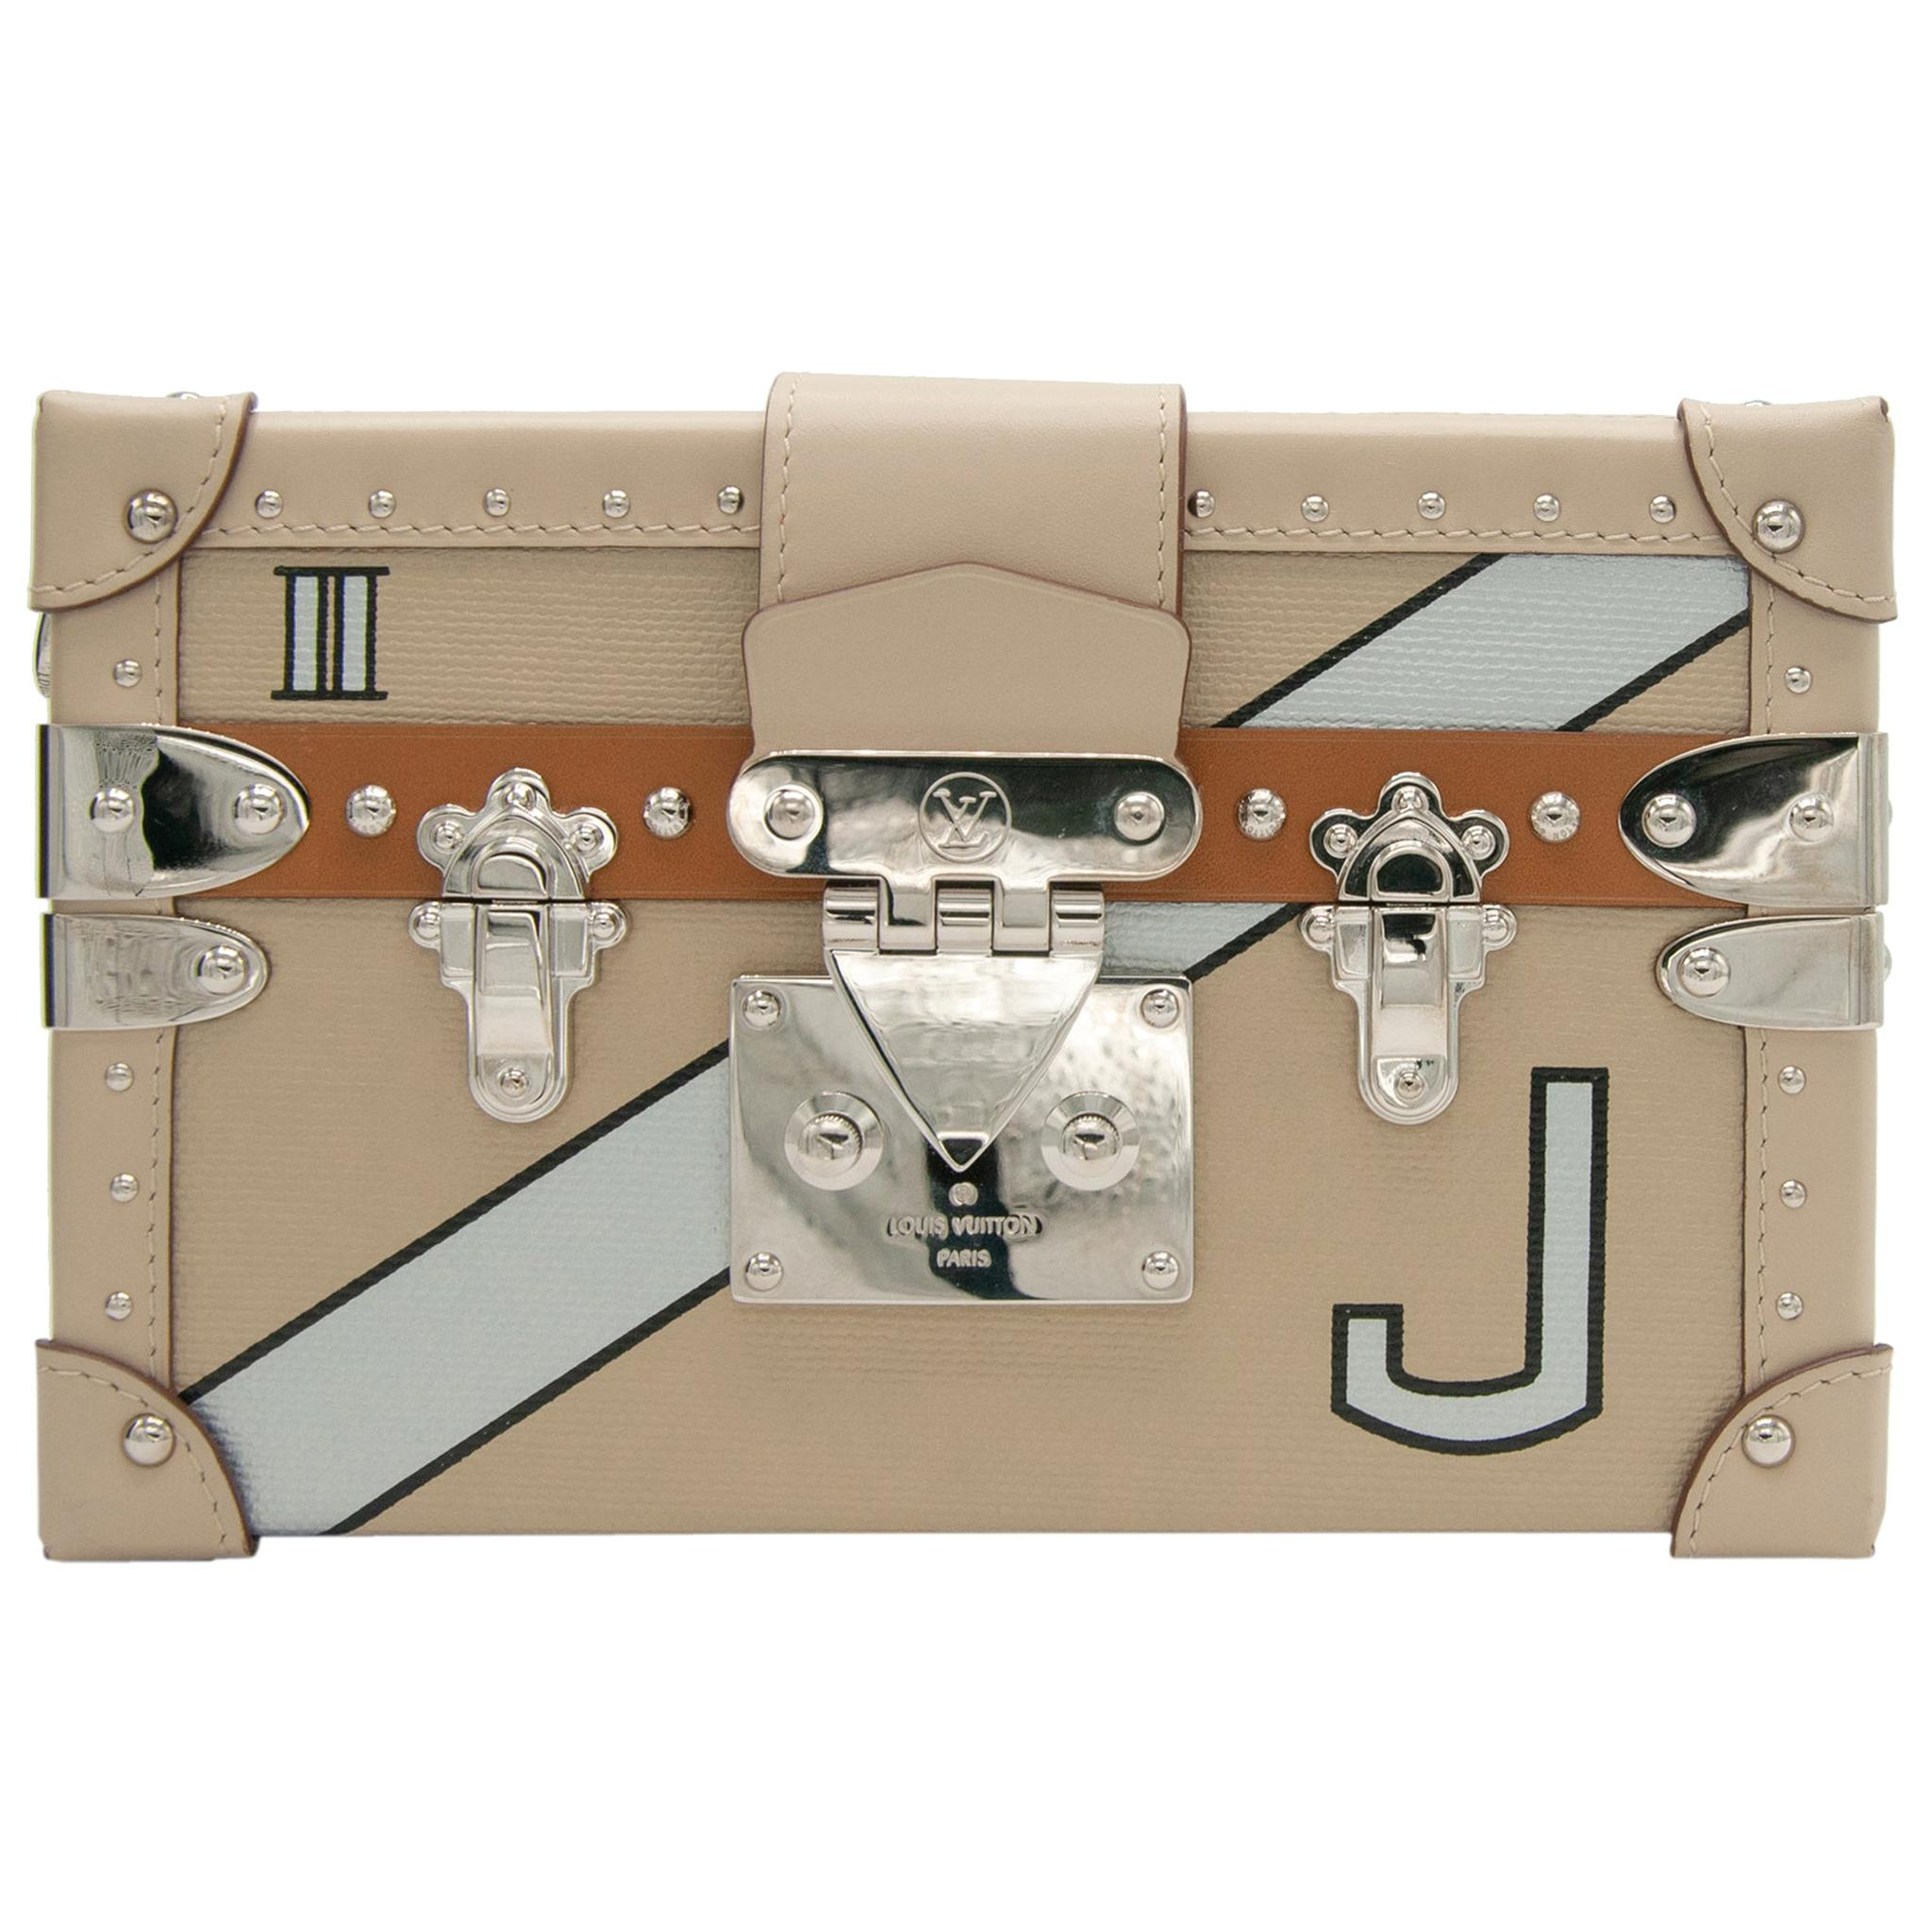 Louis Vuitton Petite Malle Epi Leather Beige